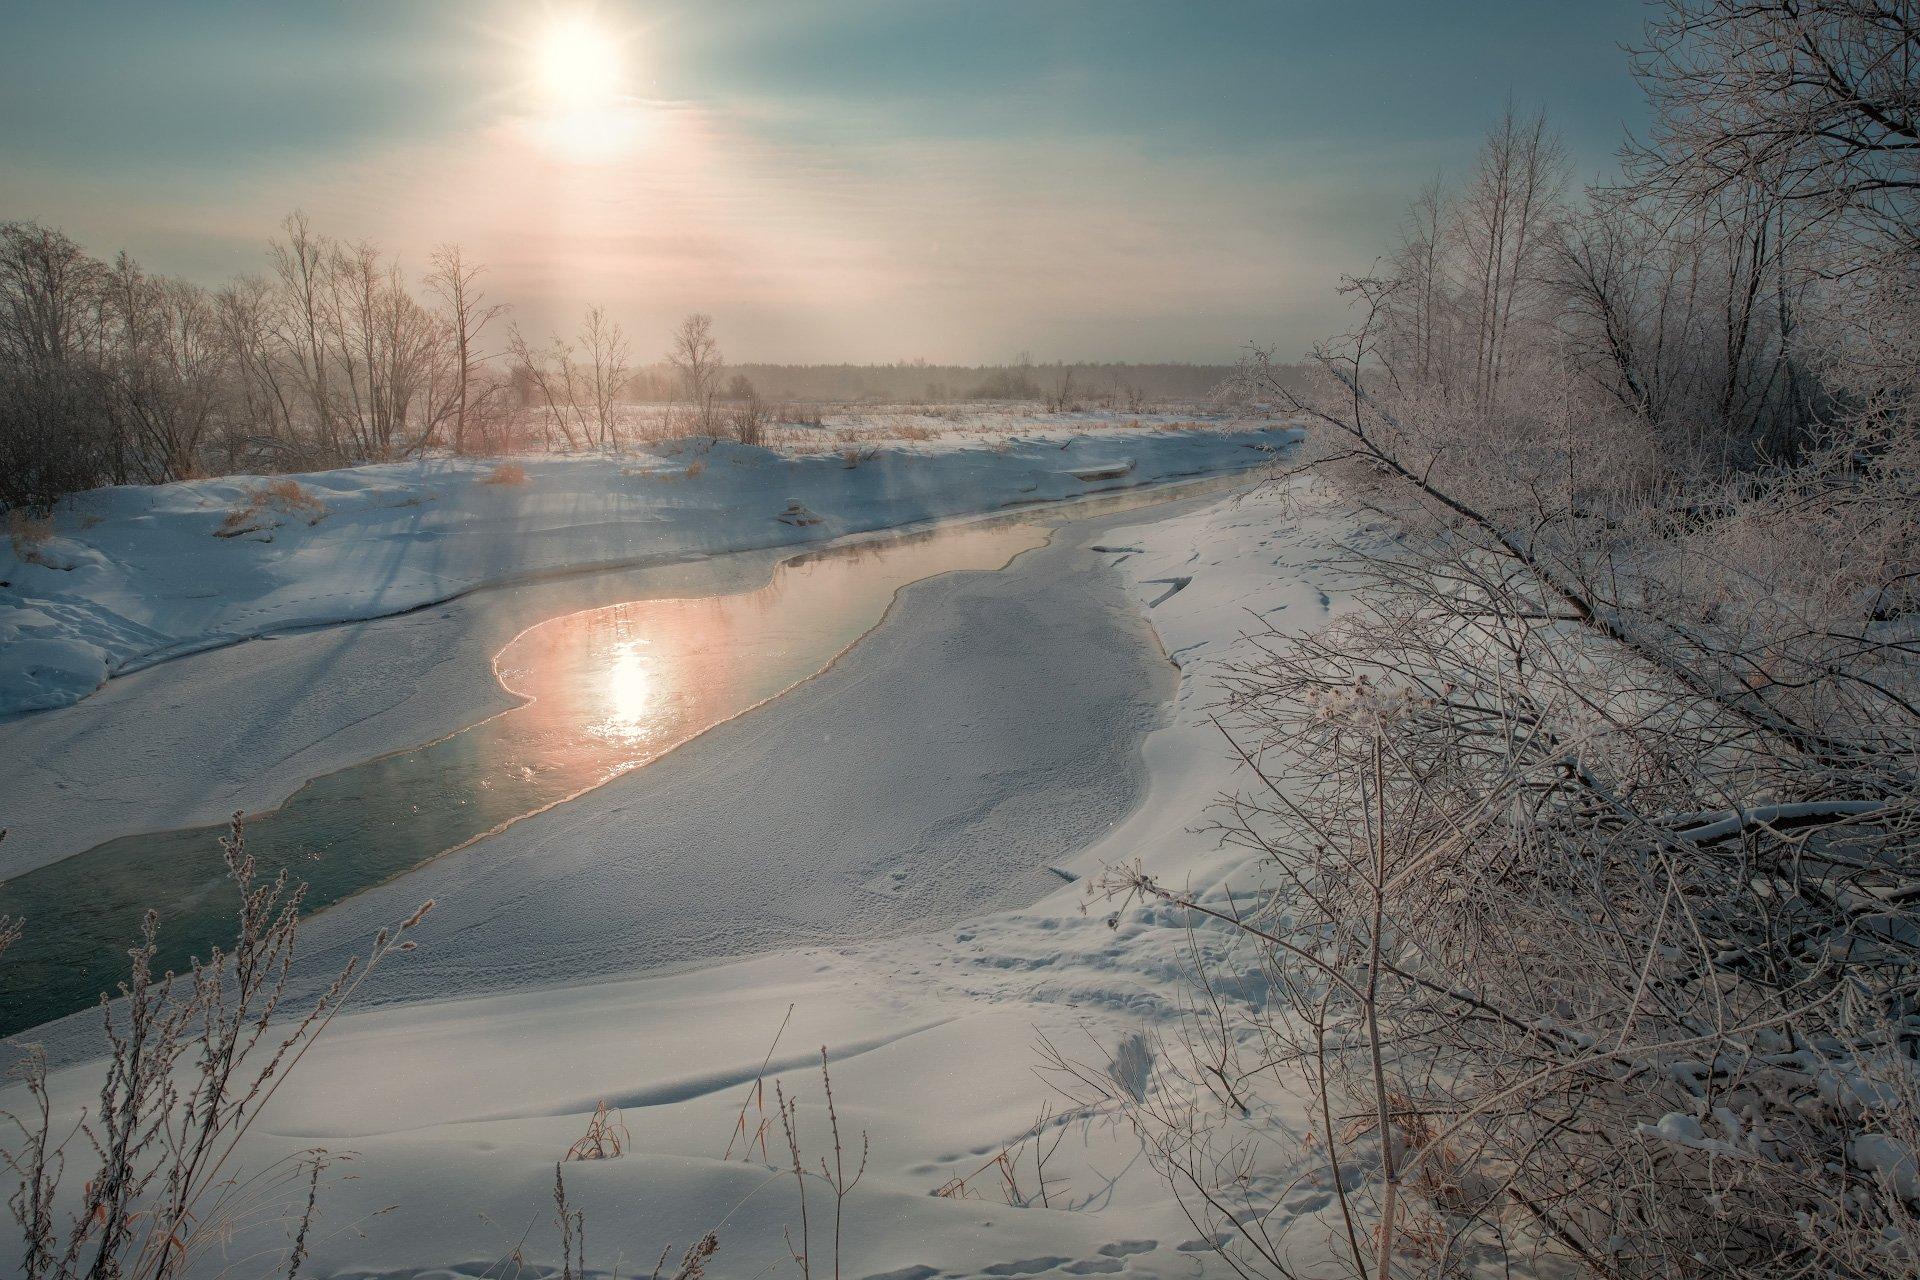 пейзаж, зима, река, лед, снег, утро, рассвет, восход, мороз, холод, усолка, пермь, пермский край, Андрей Чиж